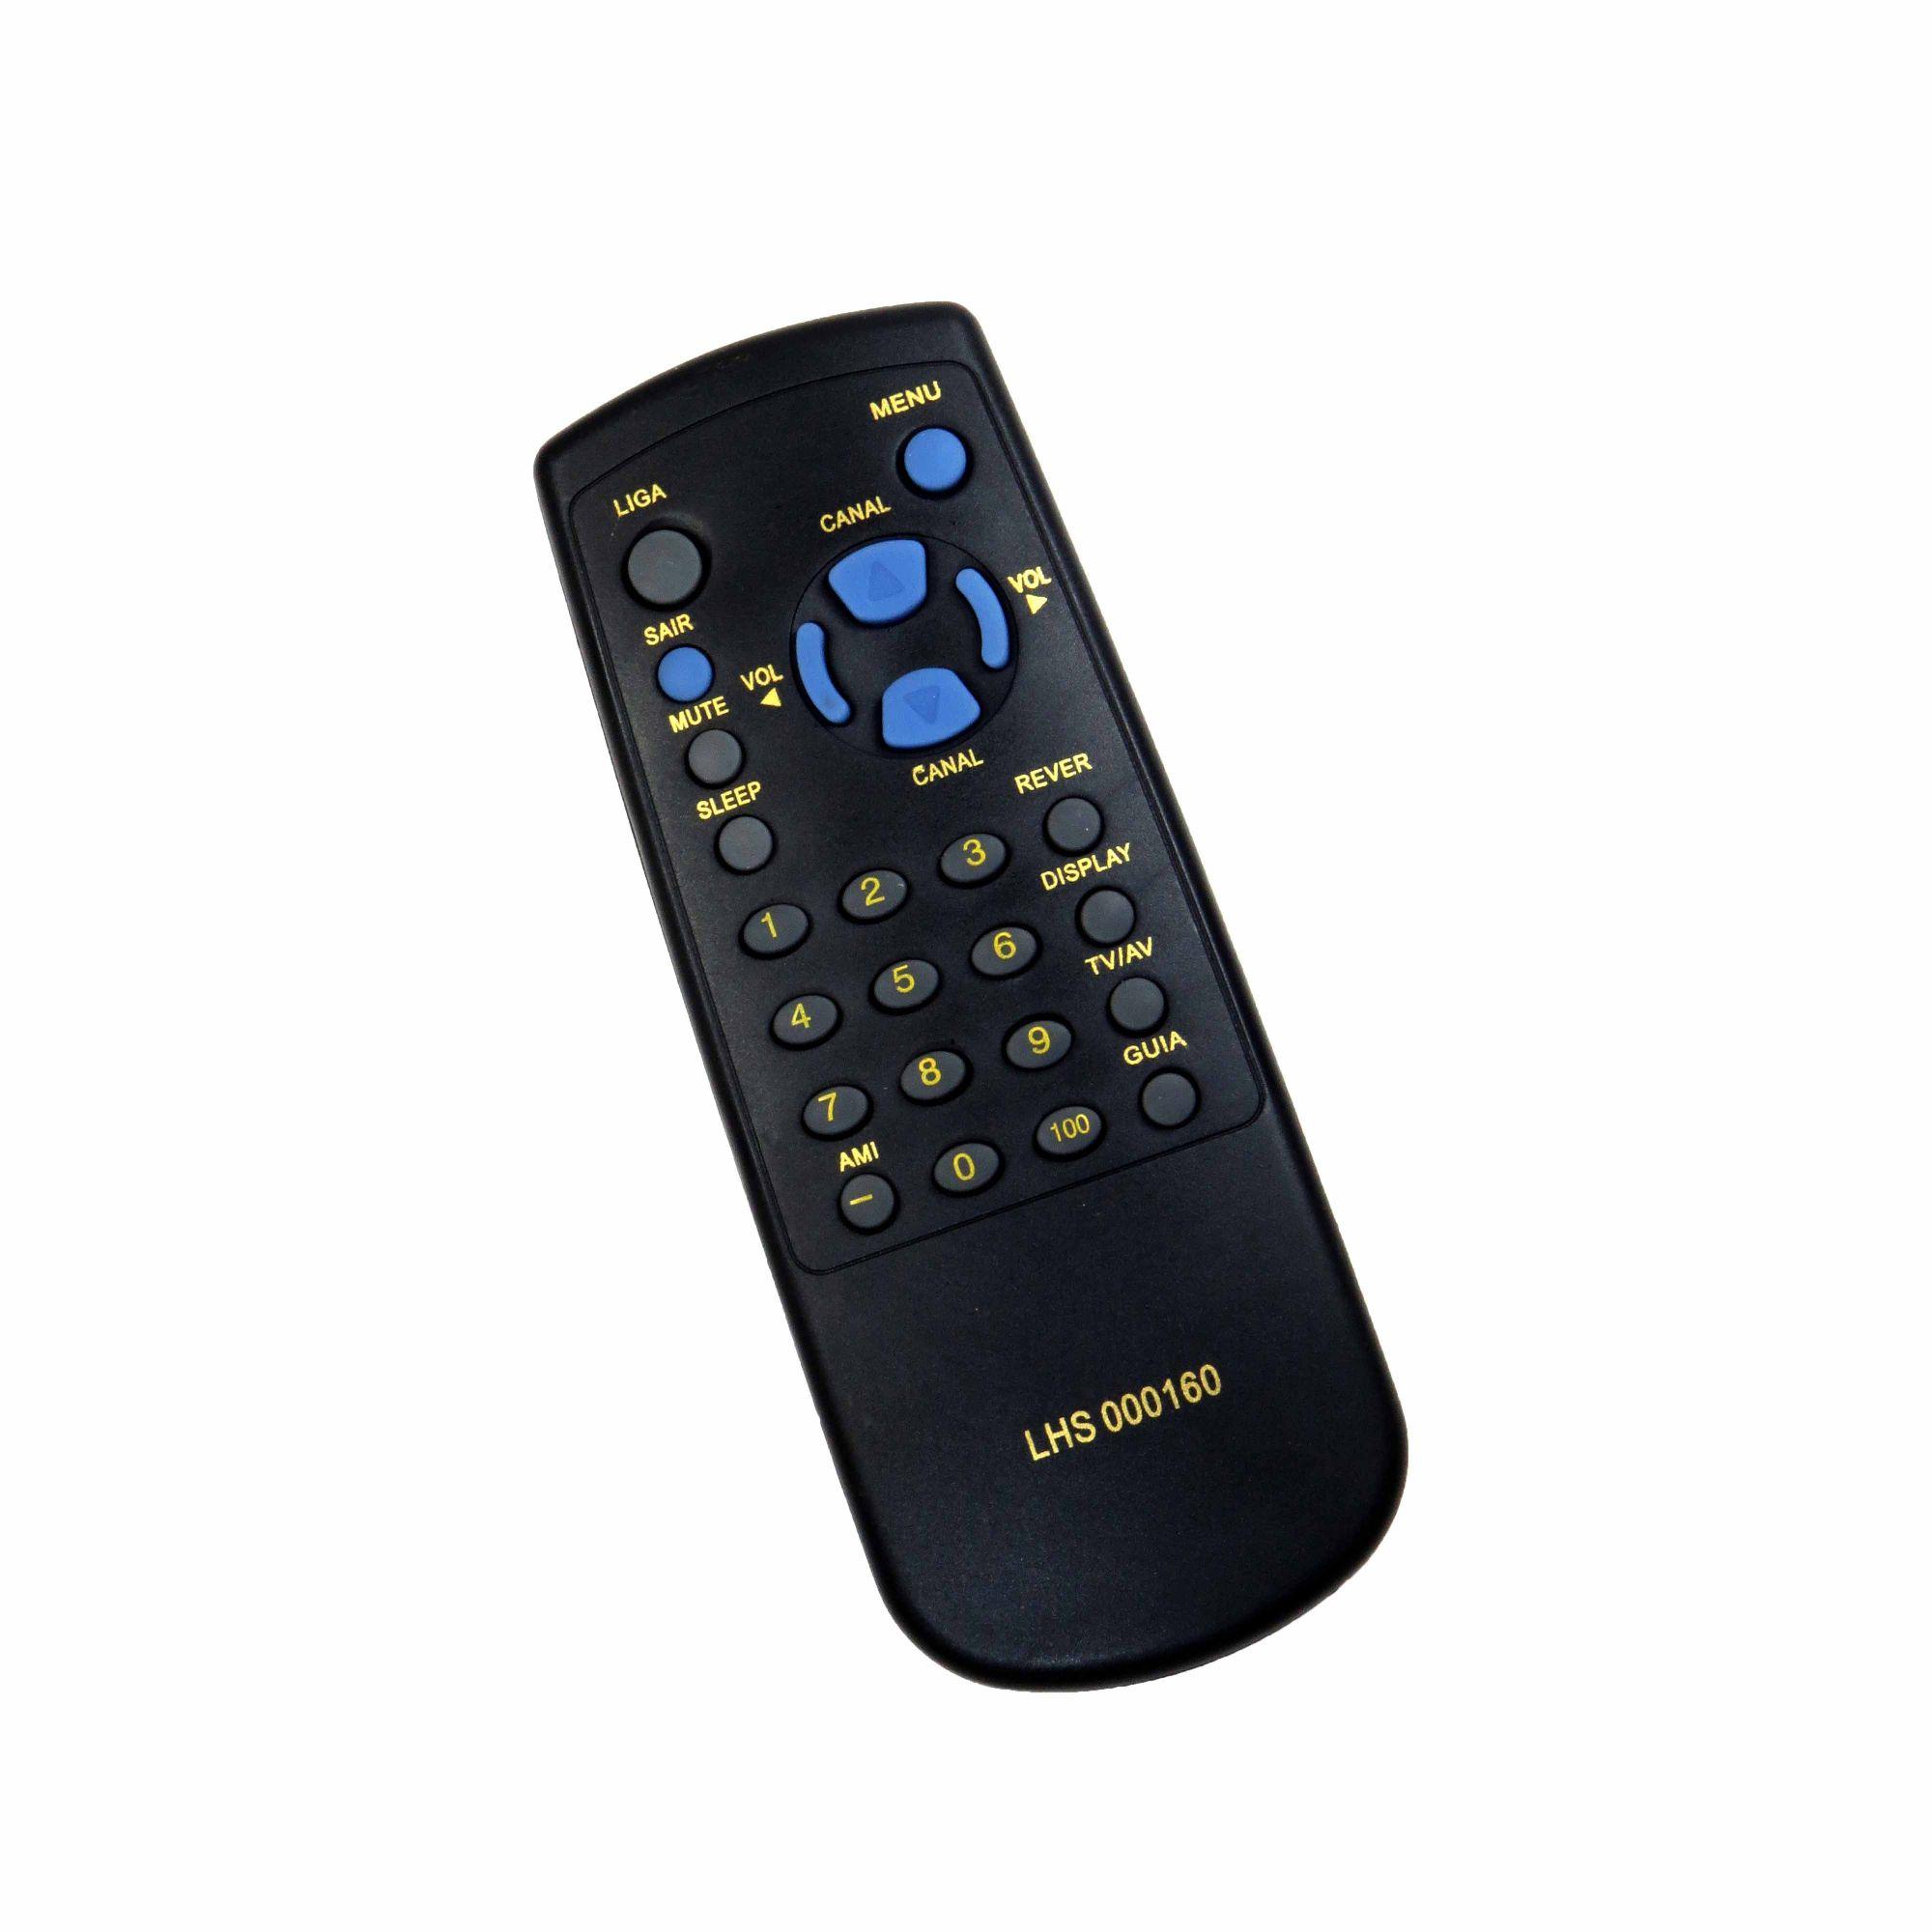 Controle Remoto Para TV Sharp Tubo C1438 C2038 000160 000137